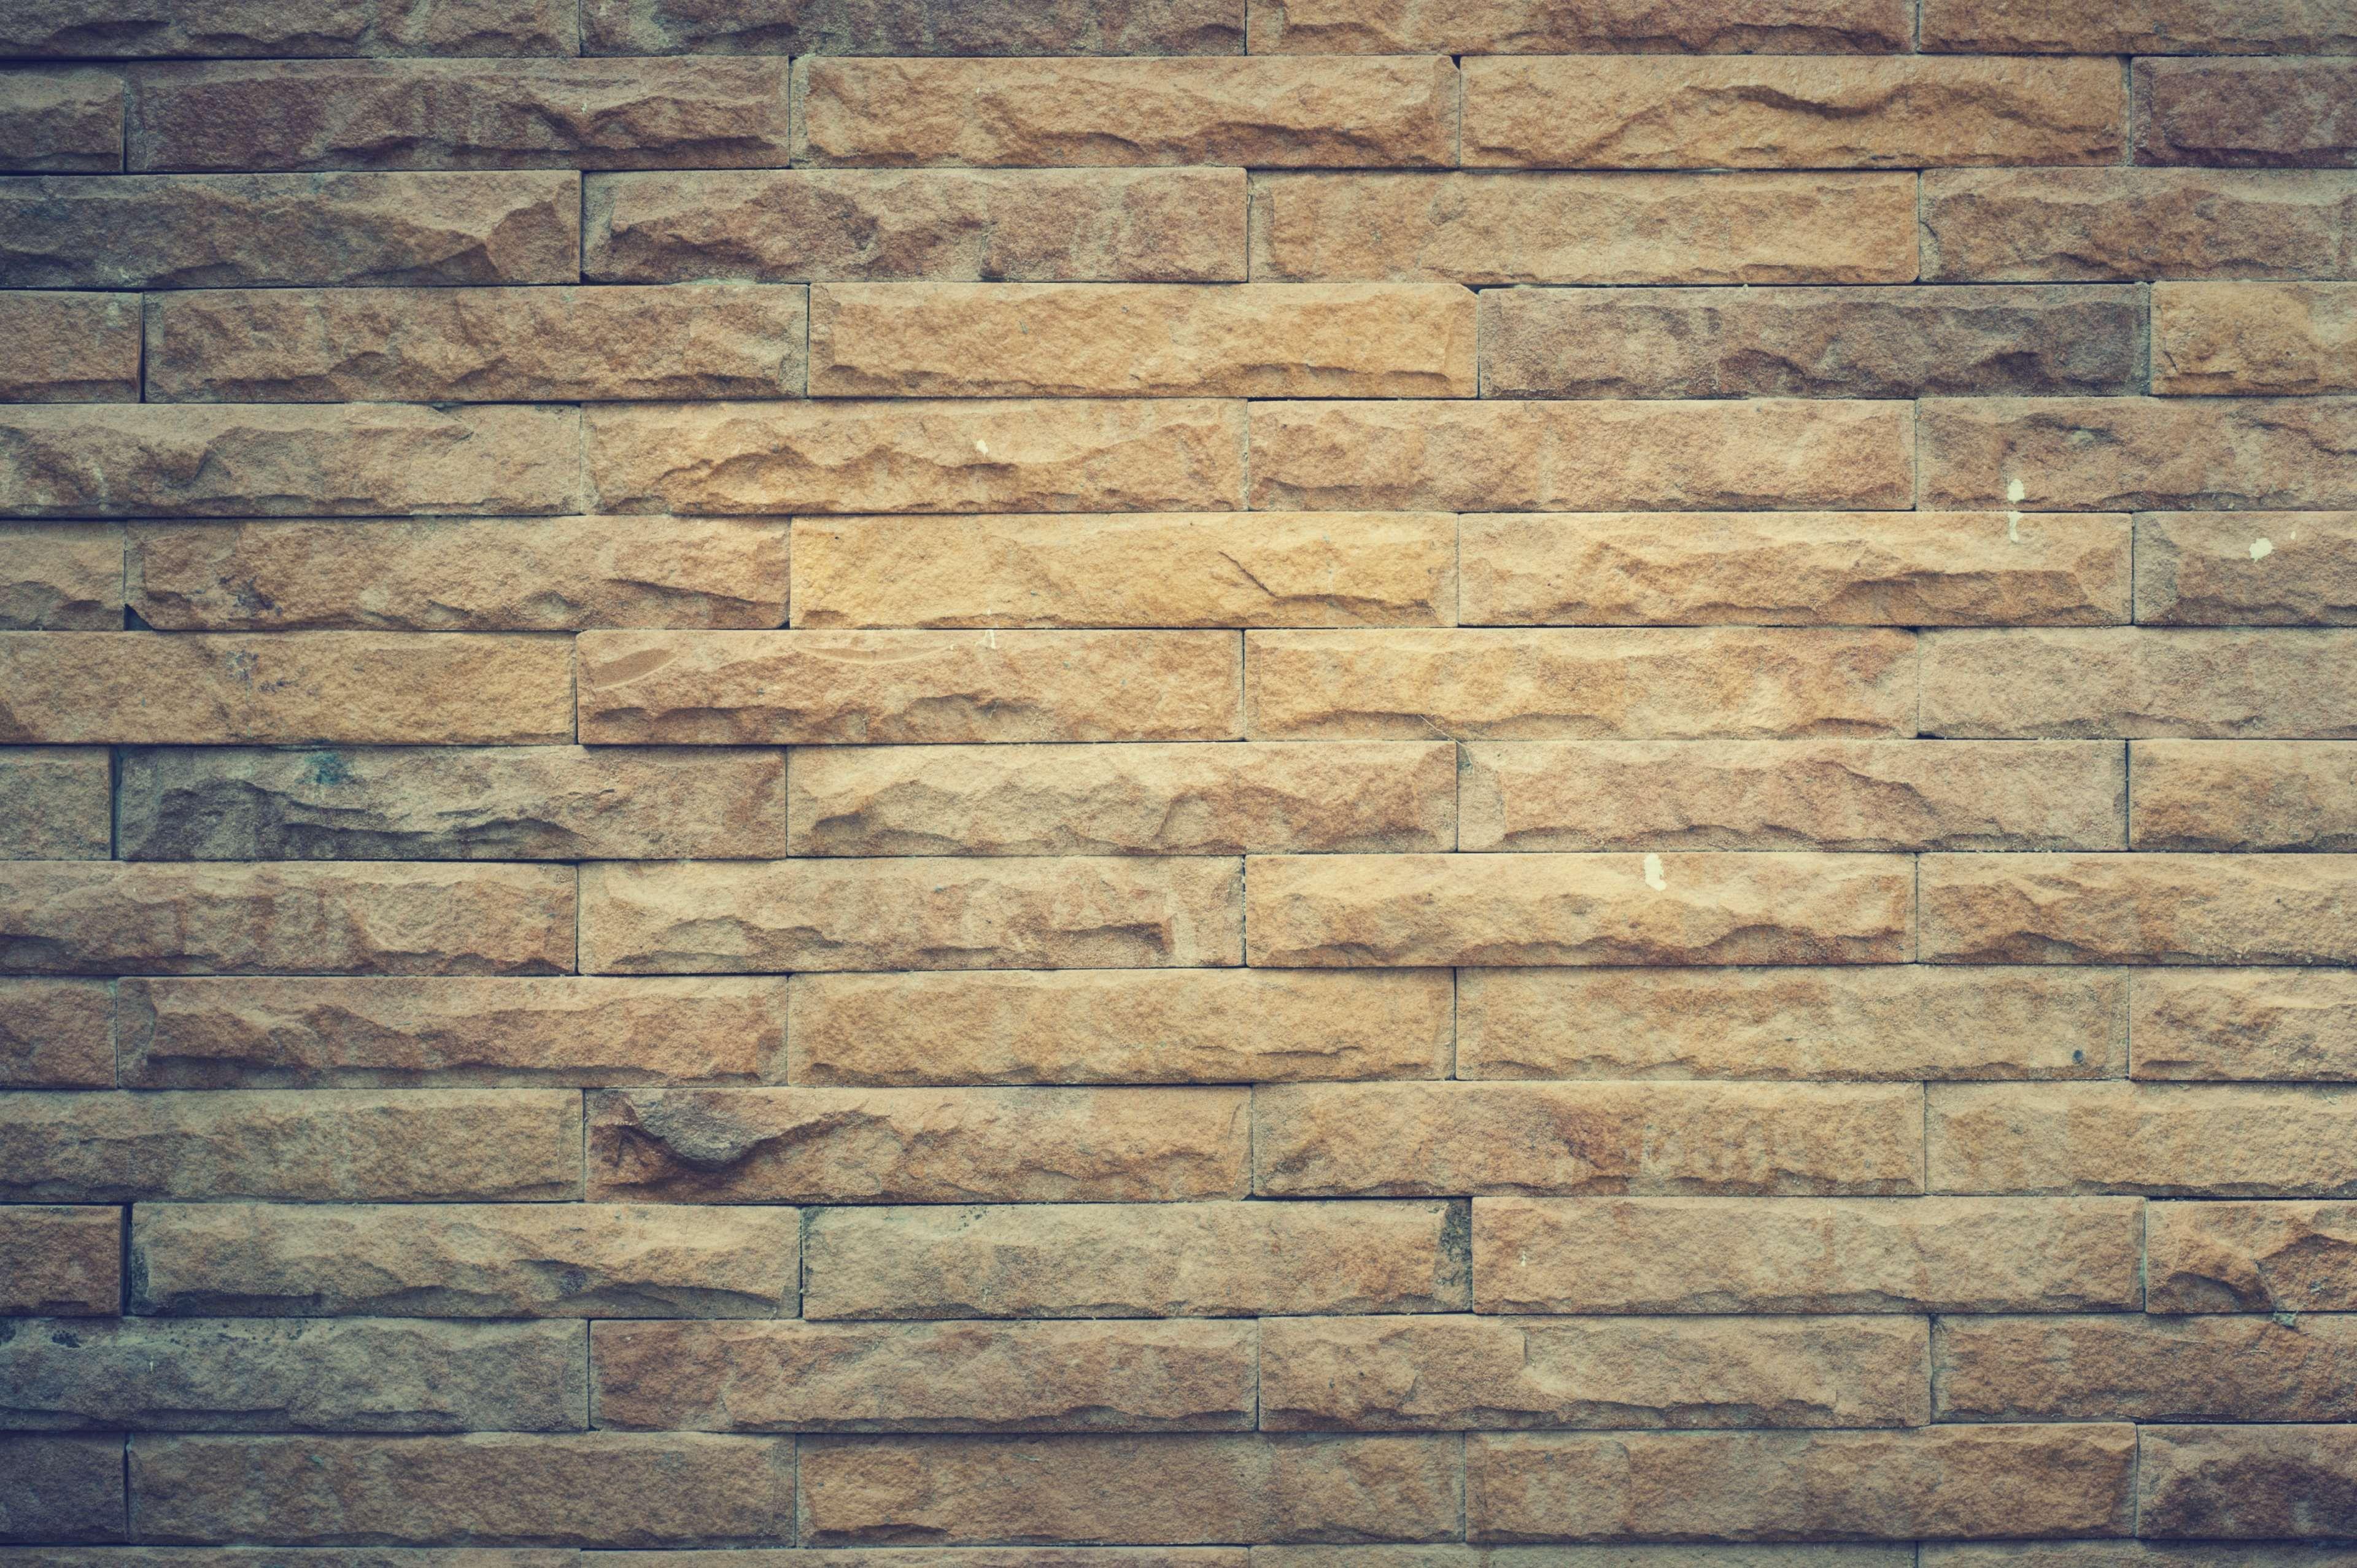 aged #backdrop #backstein #brick #brickwall #brickwork #brown ...